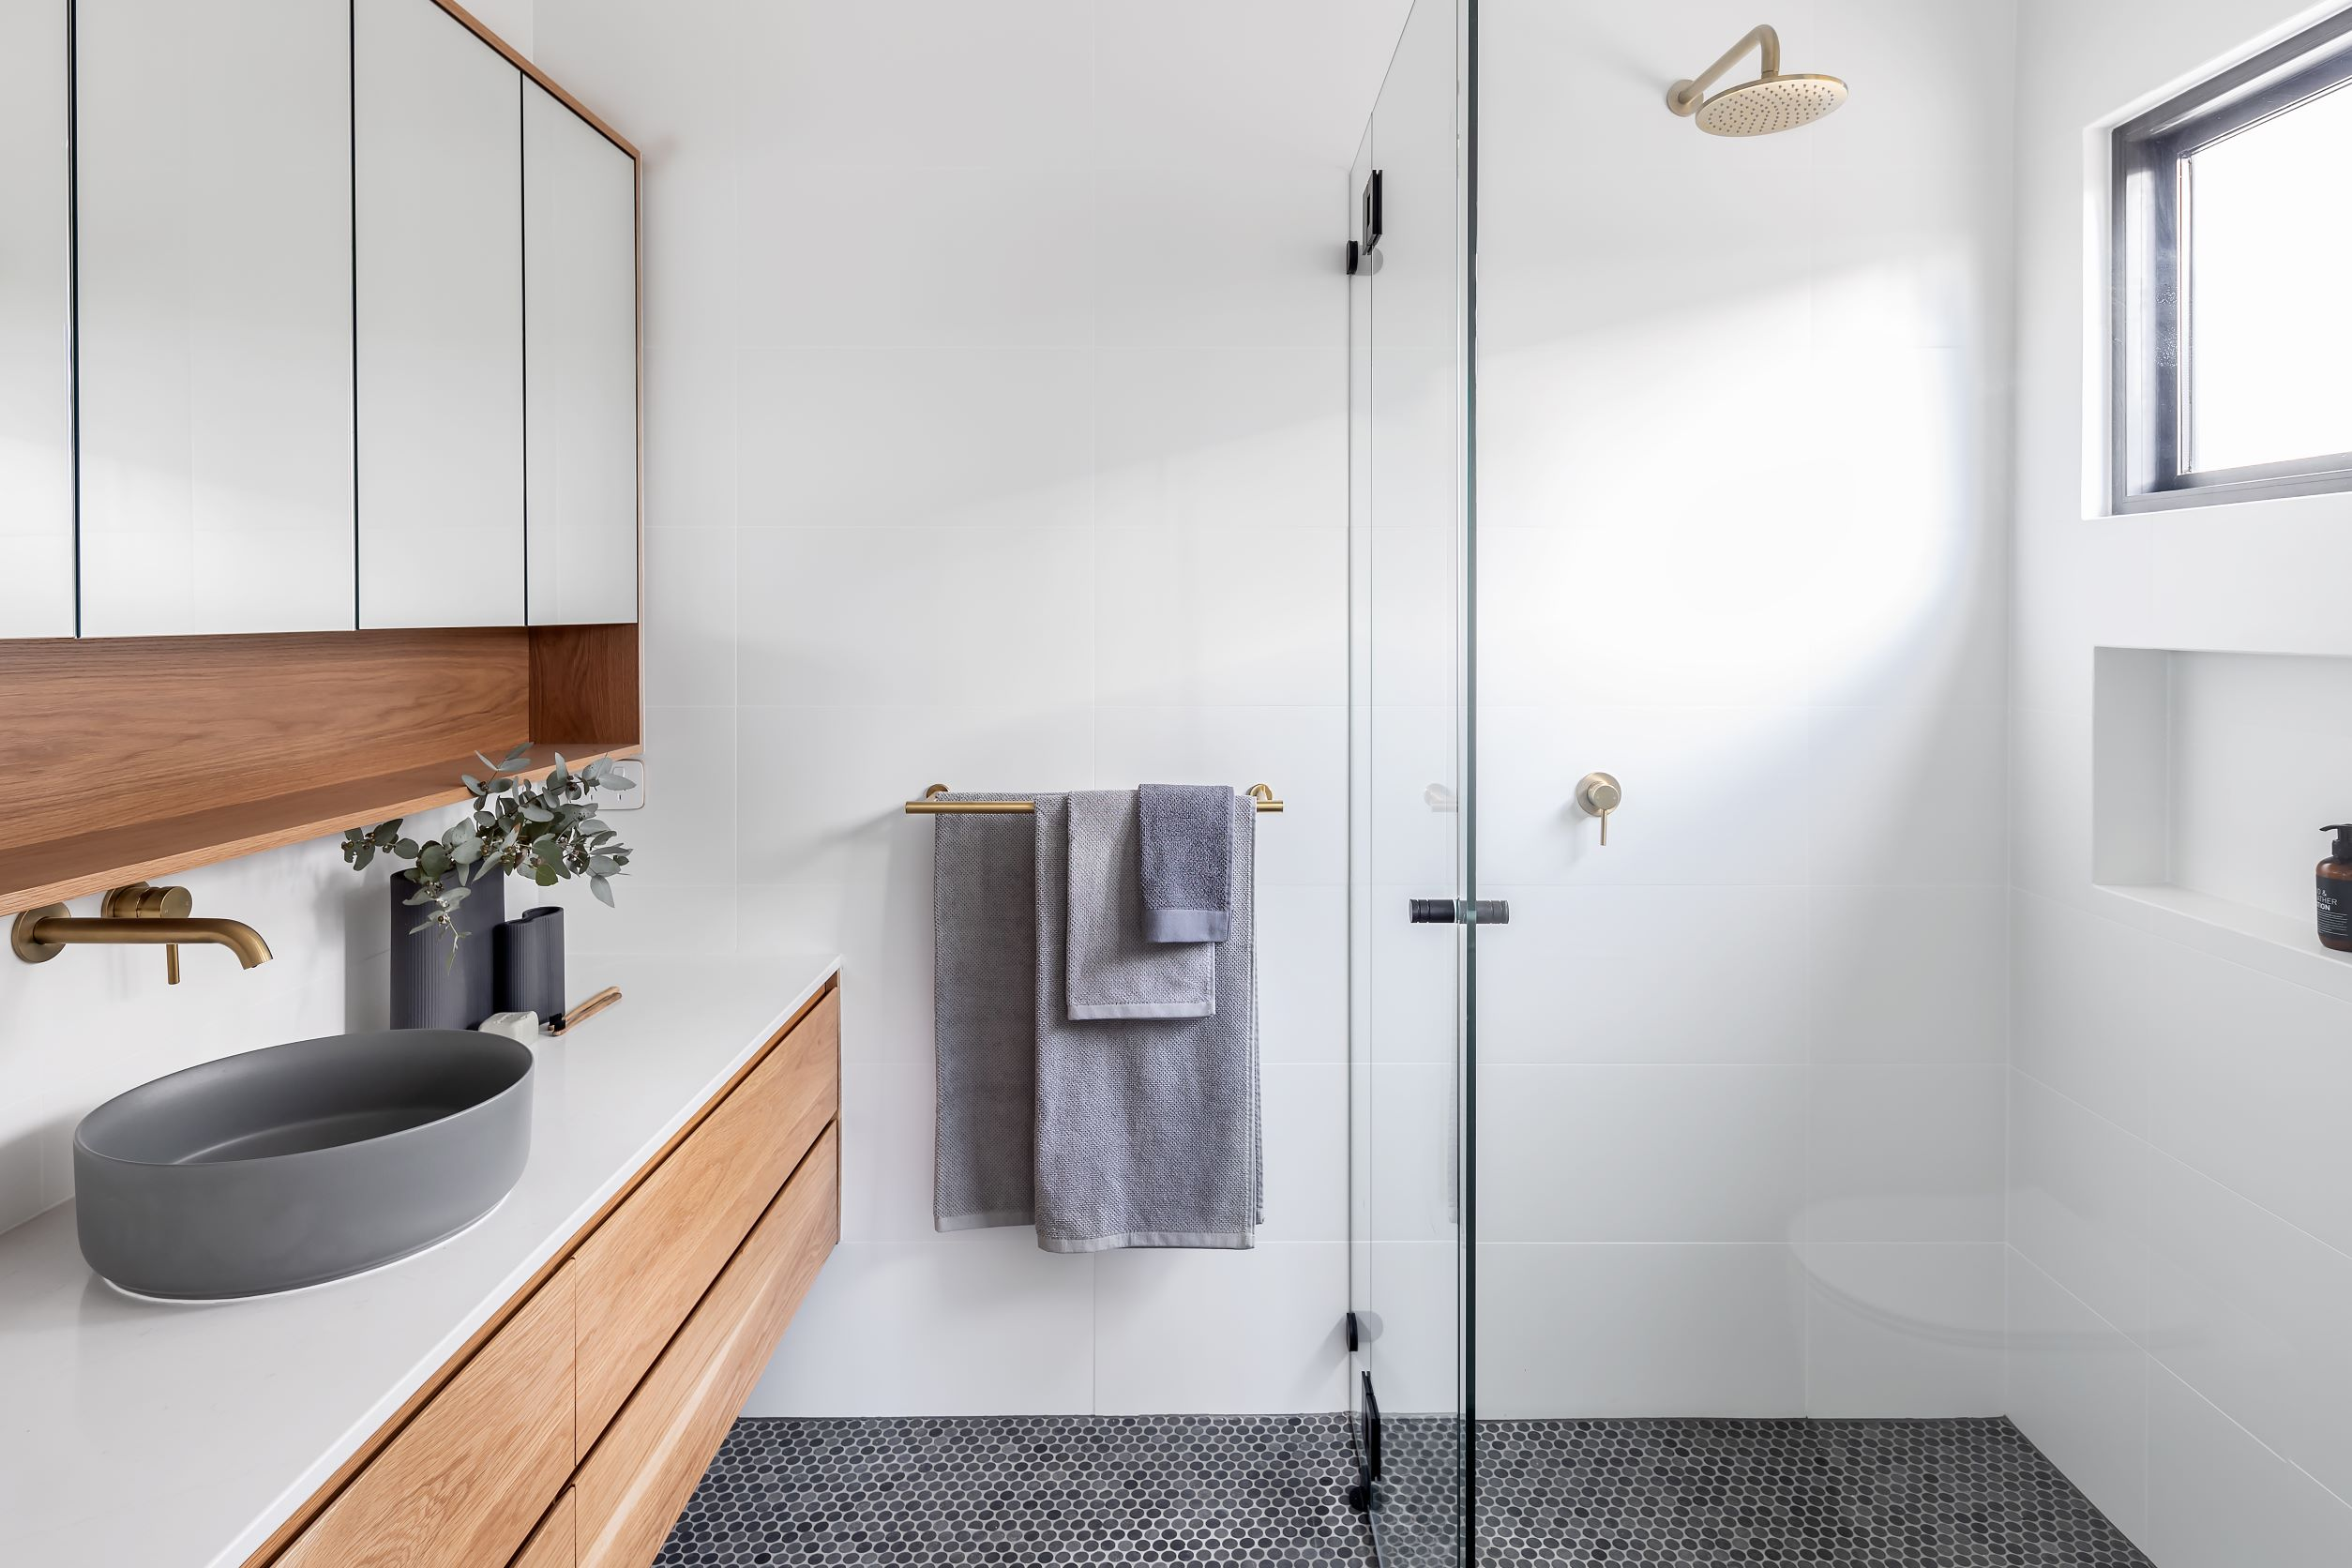 aaron-martin-constructions-dawson-street-project-bathroom